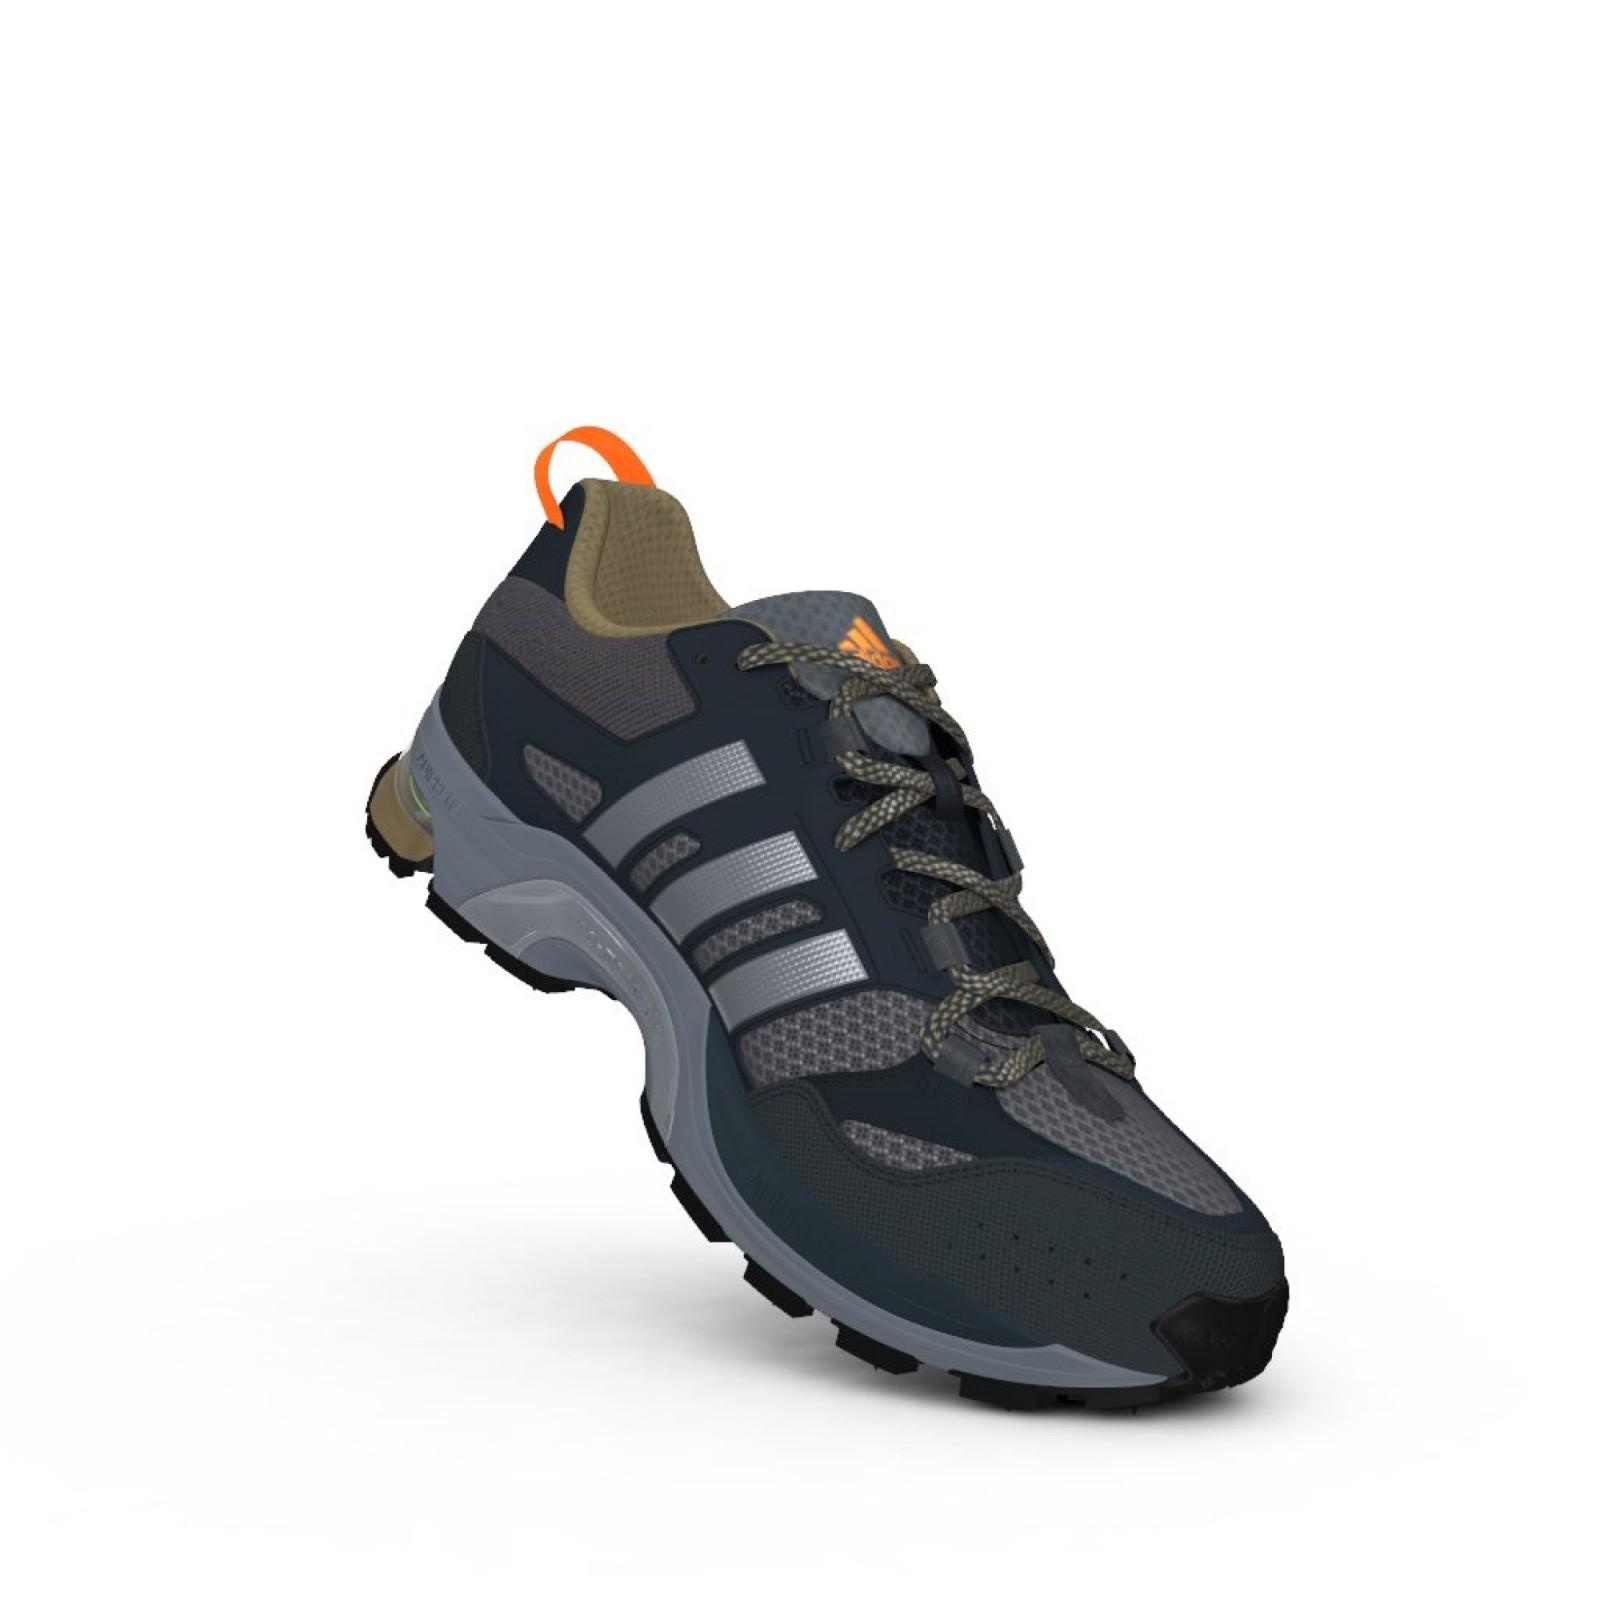 1f280d753c092 Pánské běžecké boty adidas supernova riot 5 m